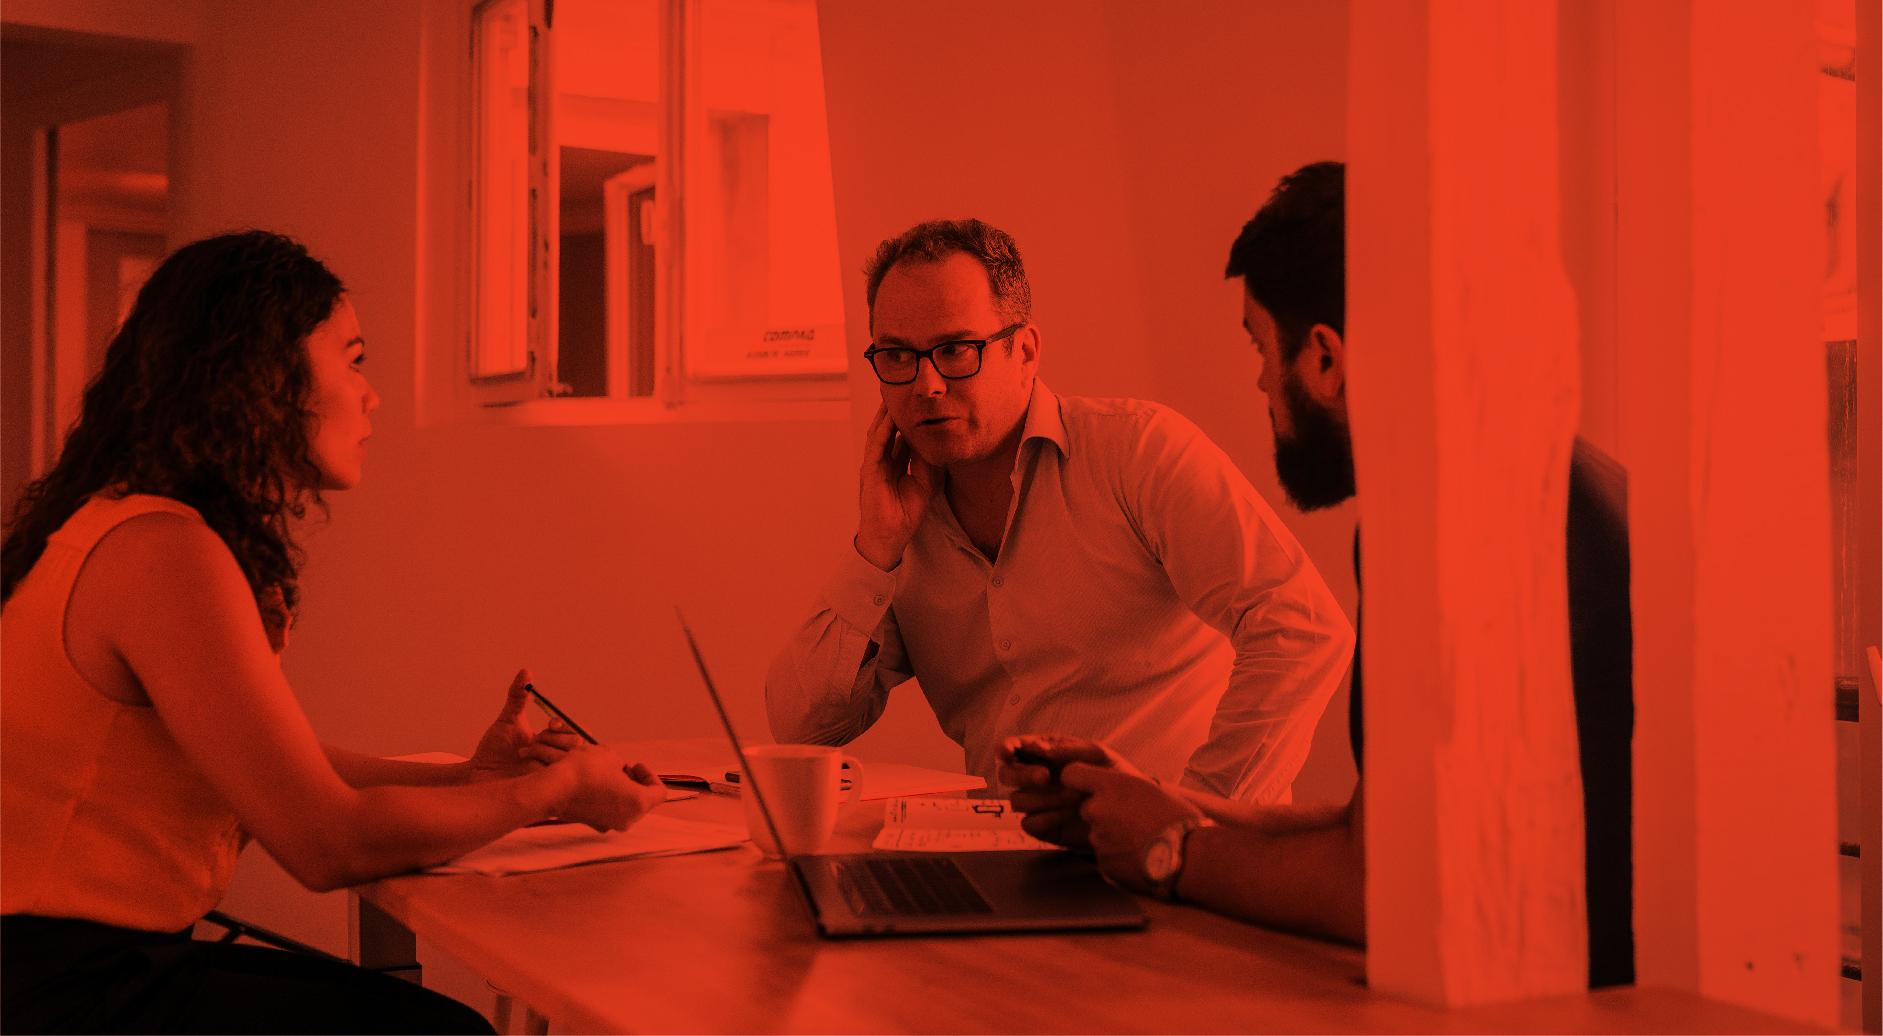 Locaux Thalamus agence communication digitale conseil accompagnement Paris studio design